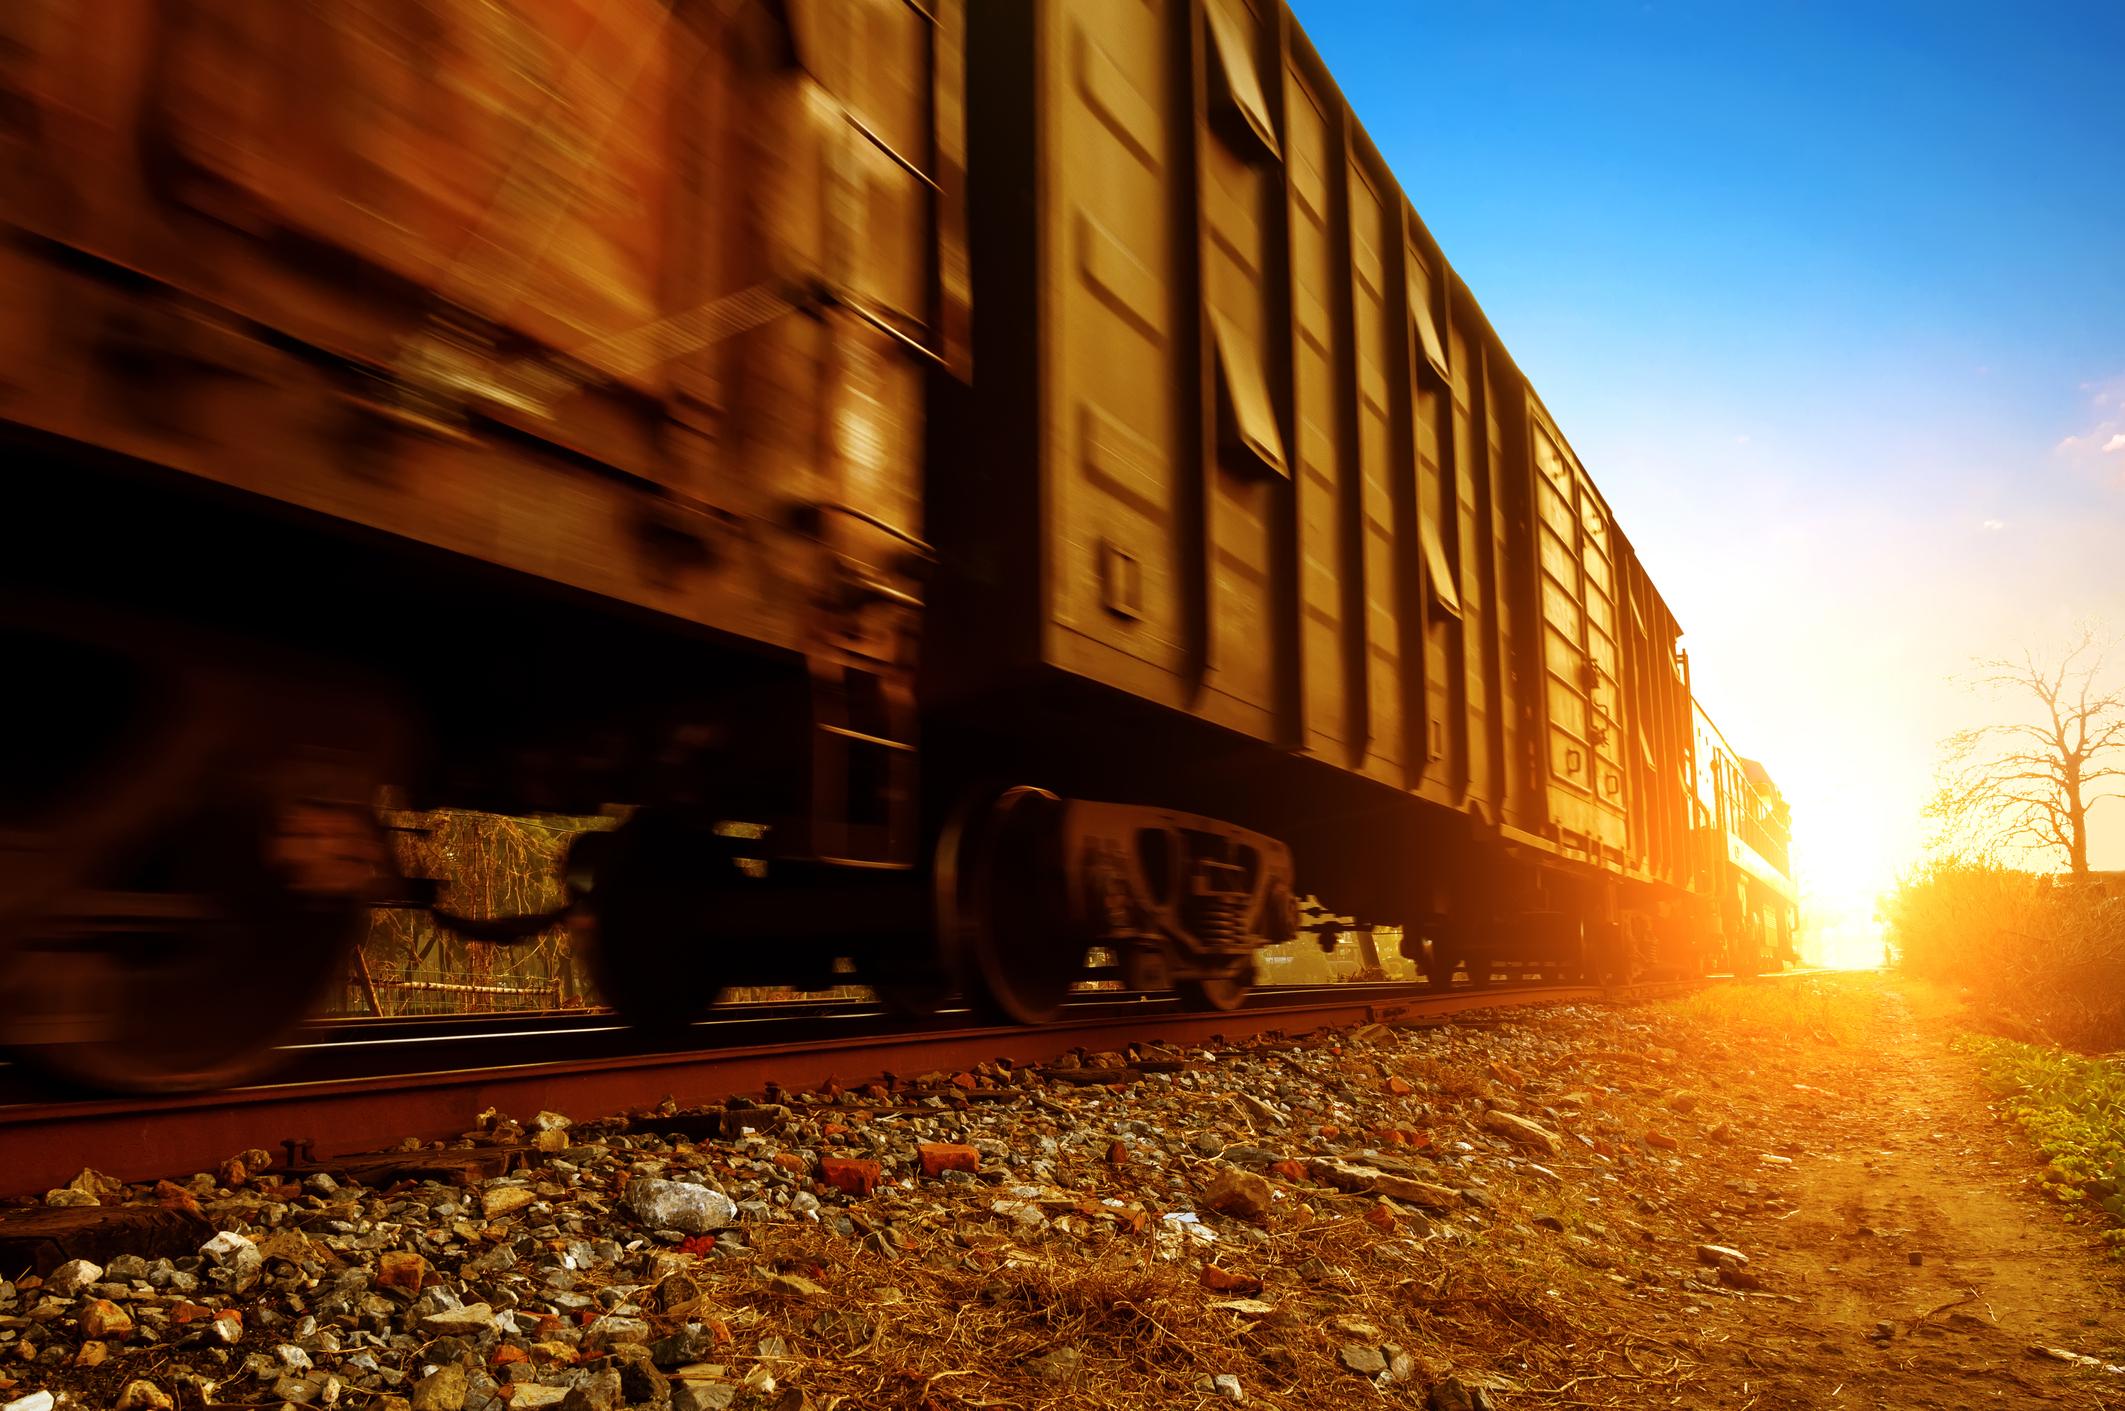 Stock photos railcar